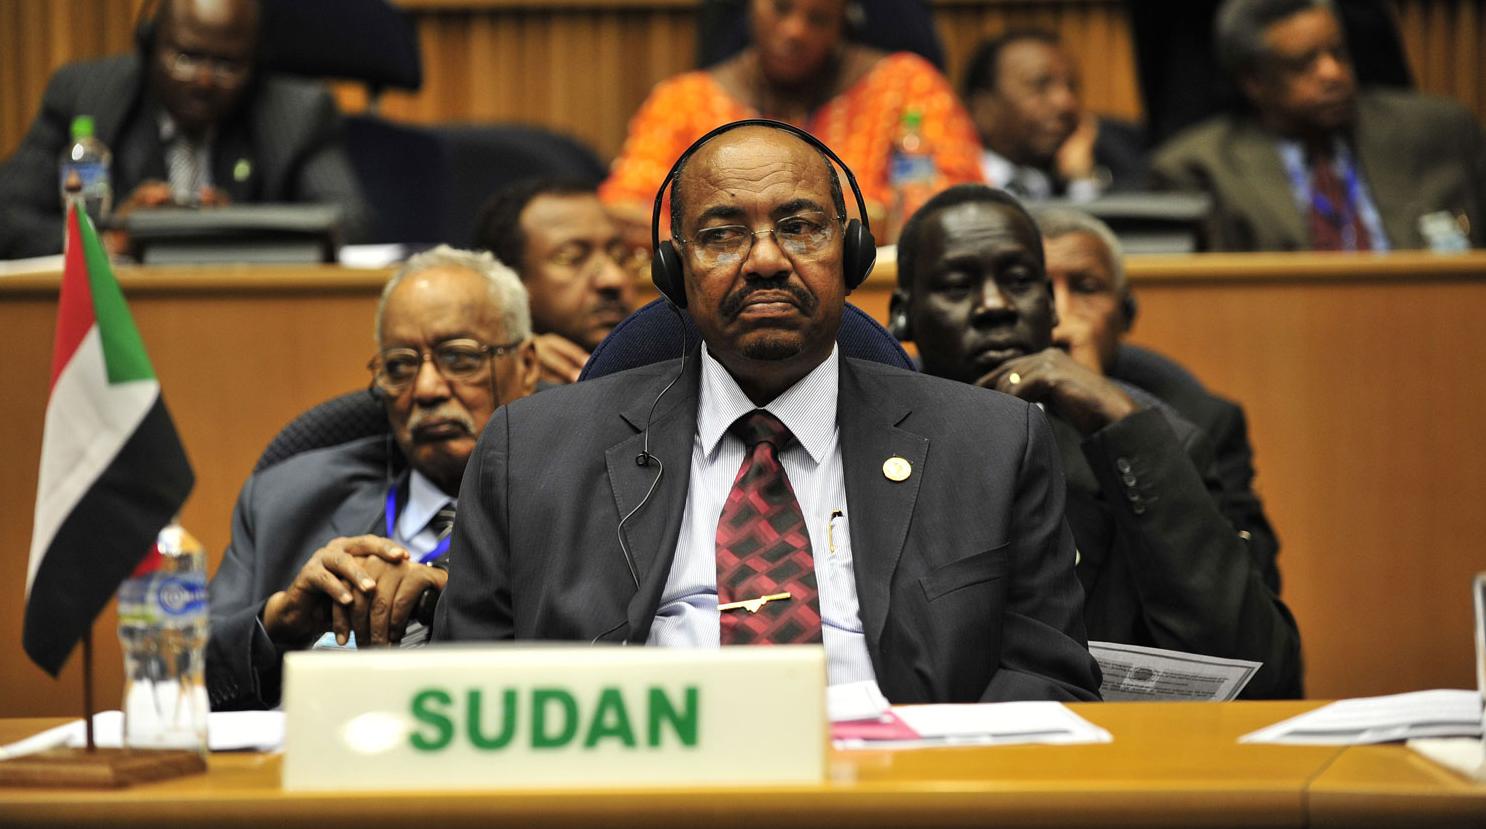 "<p>Фото: © <a href=""https://en.wikipedia.org/wiki/Omar_al-Bashir"" target=""_self"">wikipedia</a></p>"